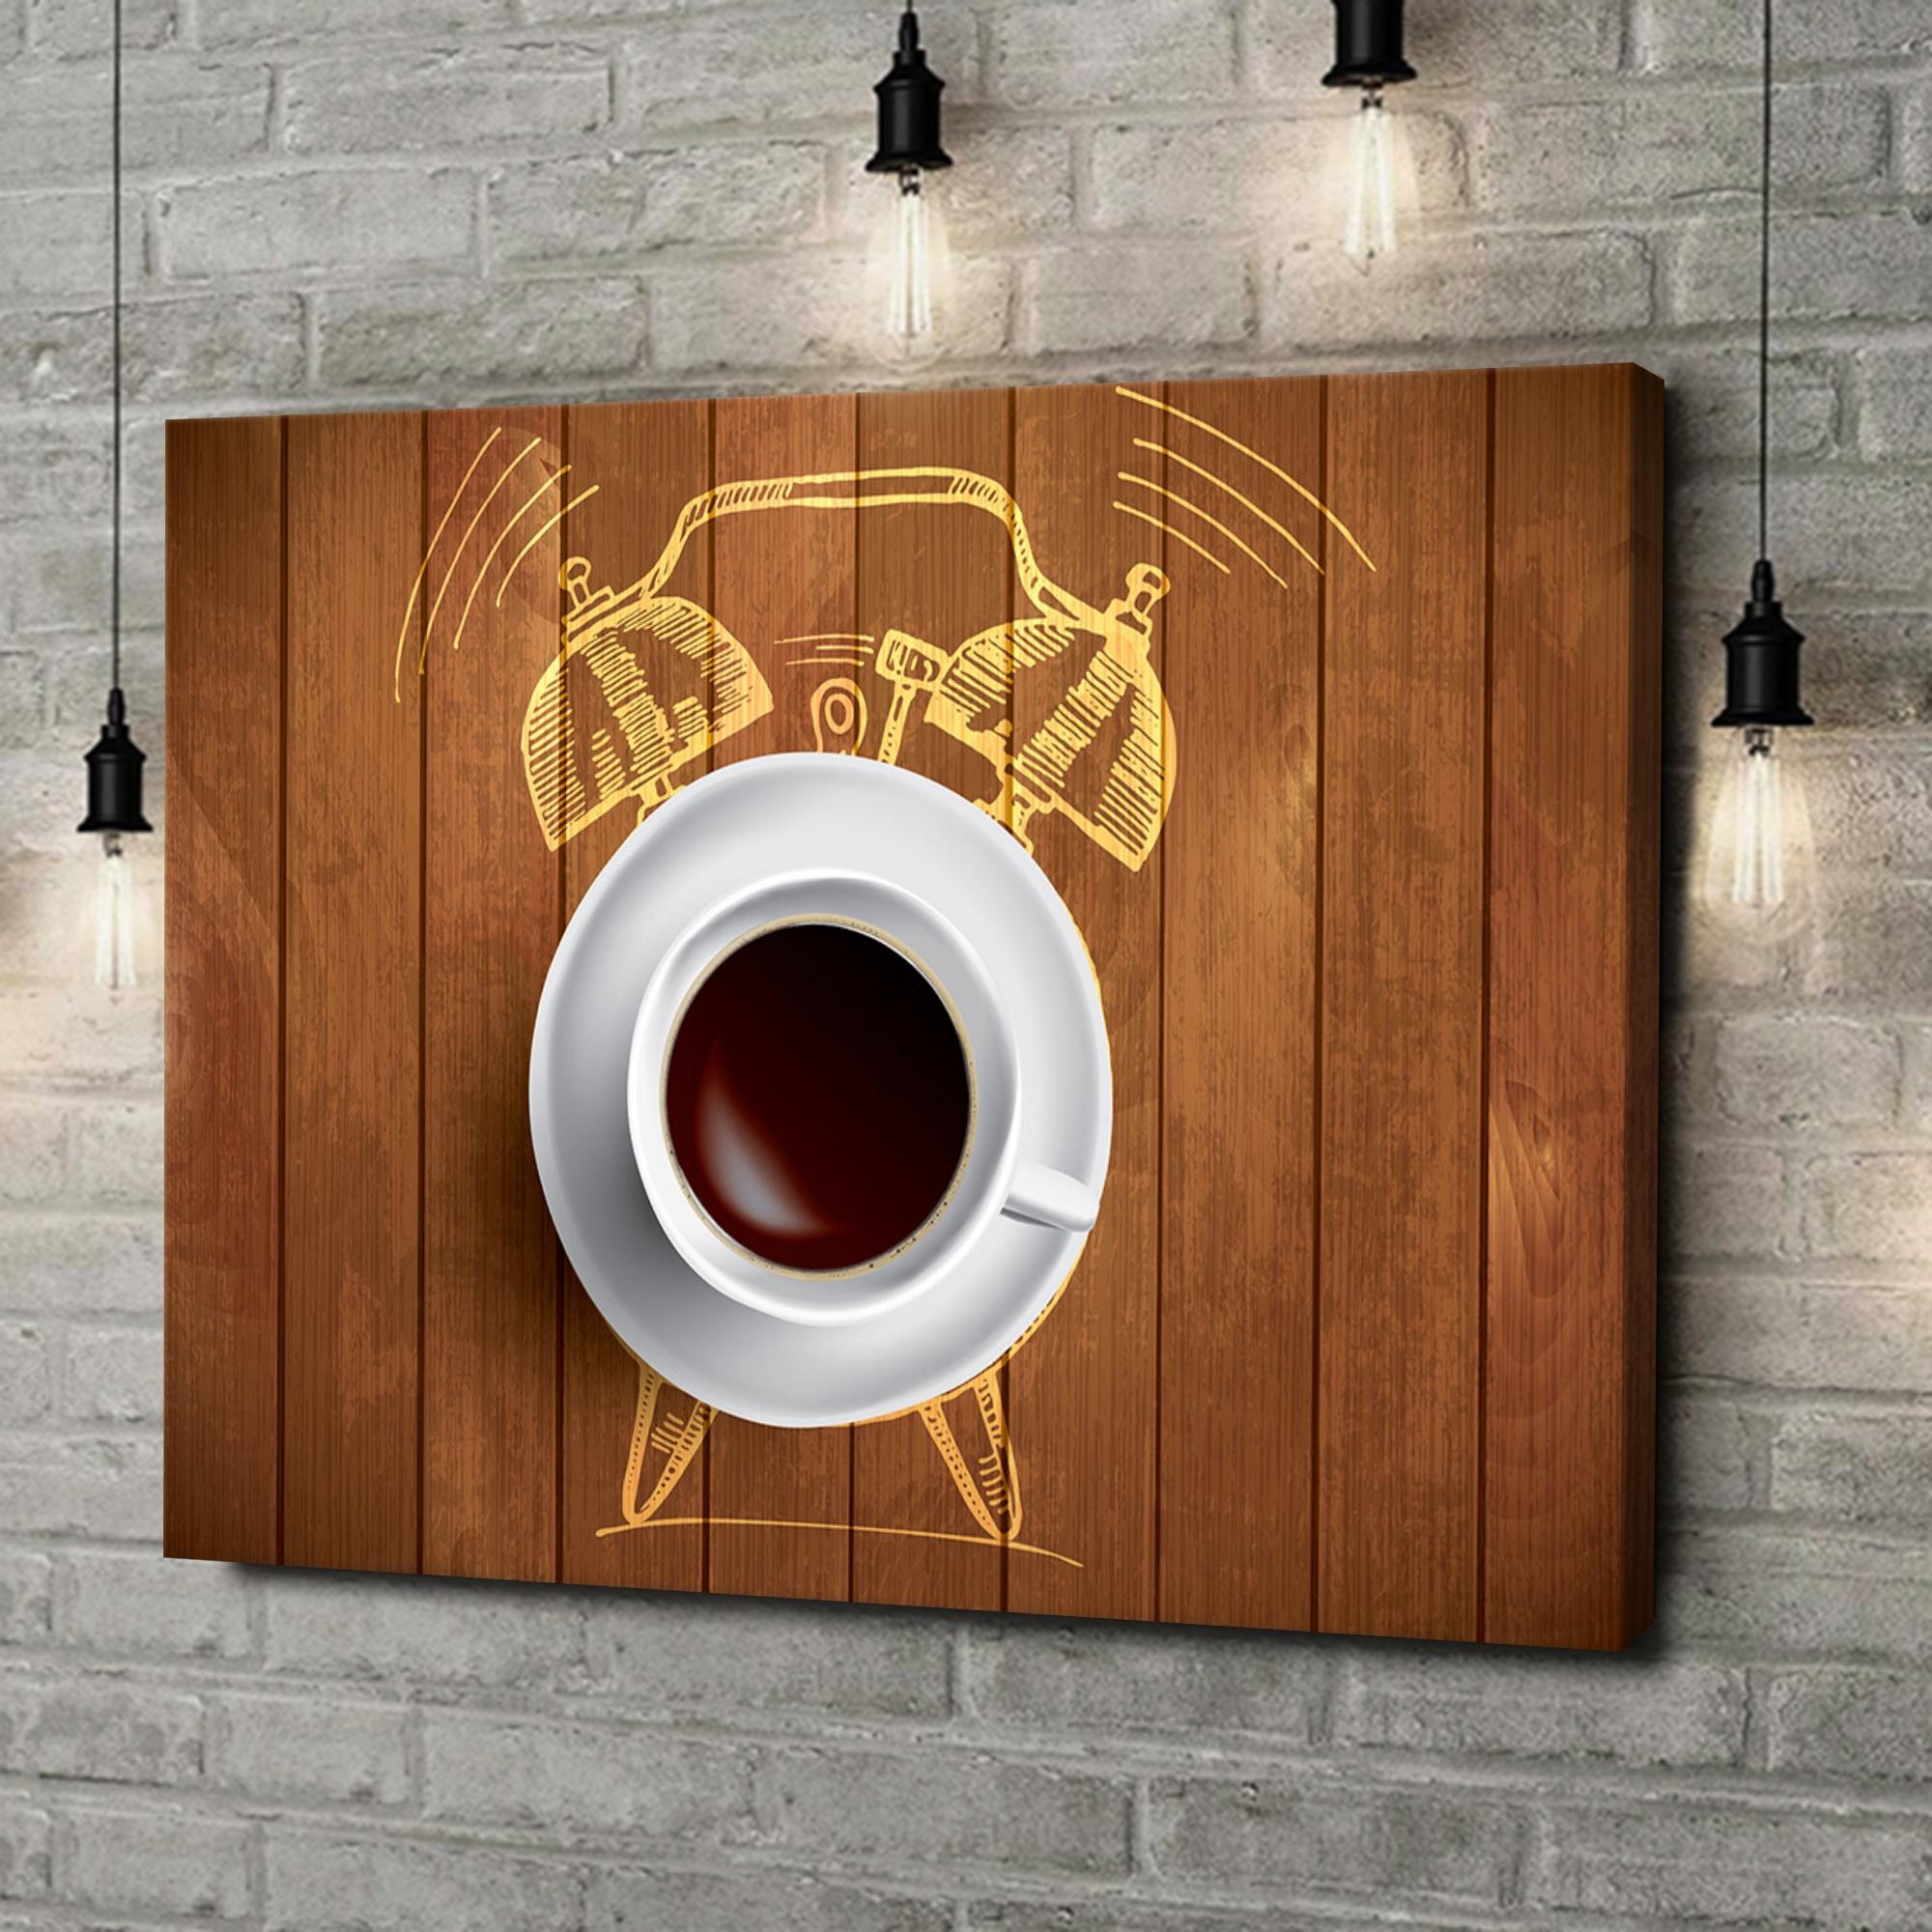 Leinwandbild personalisiert Kaffeewecker